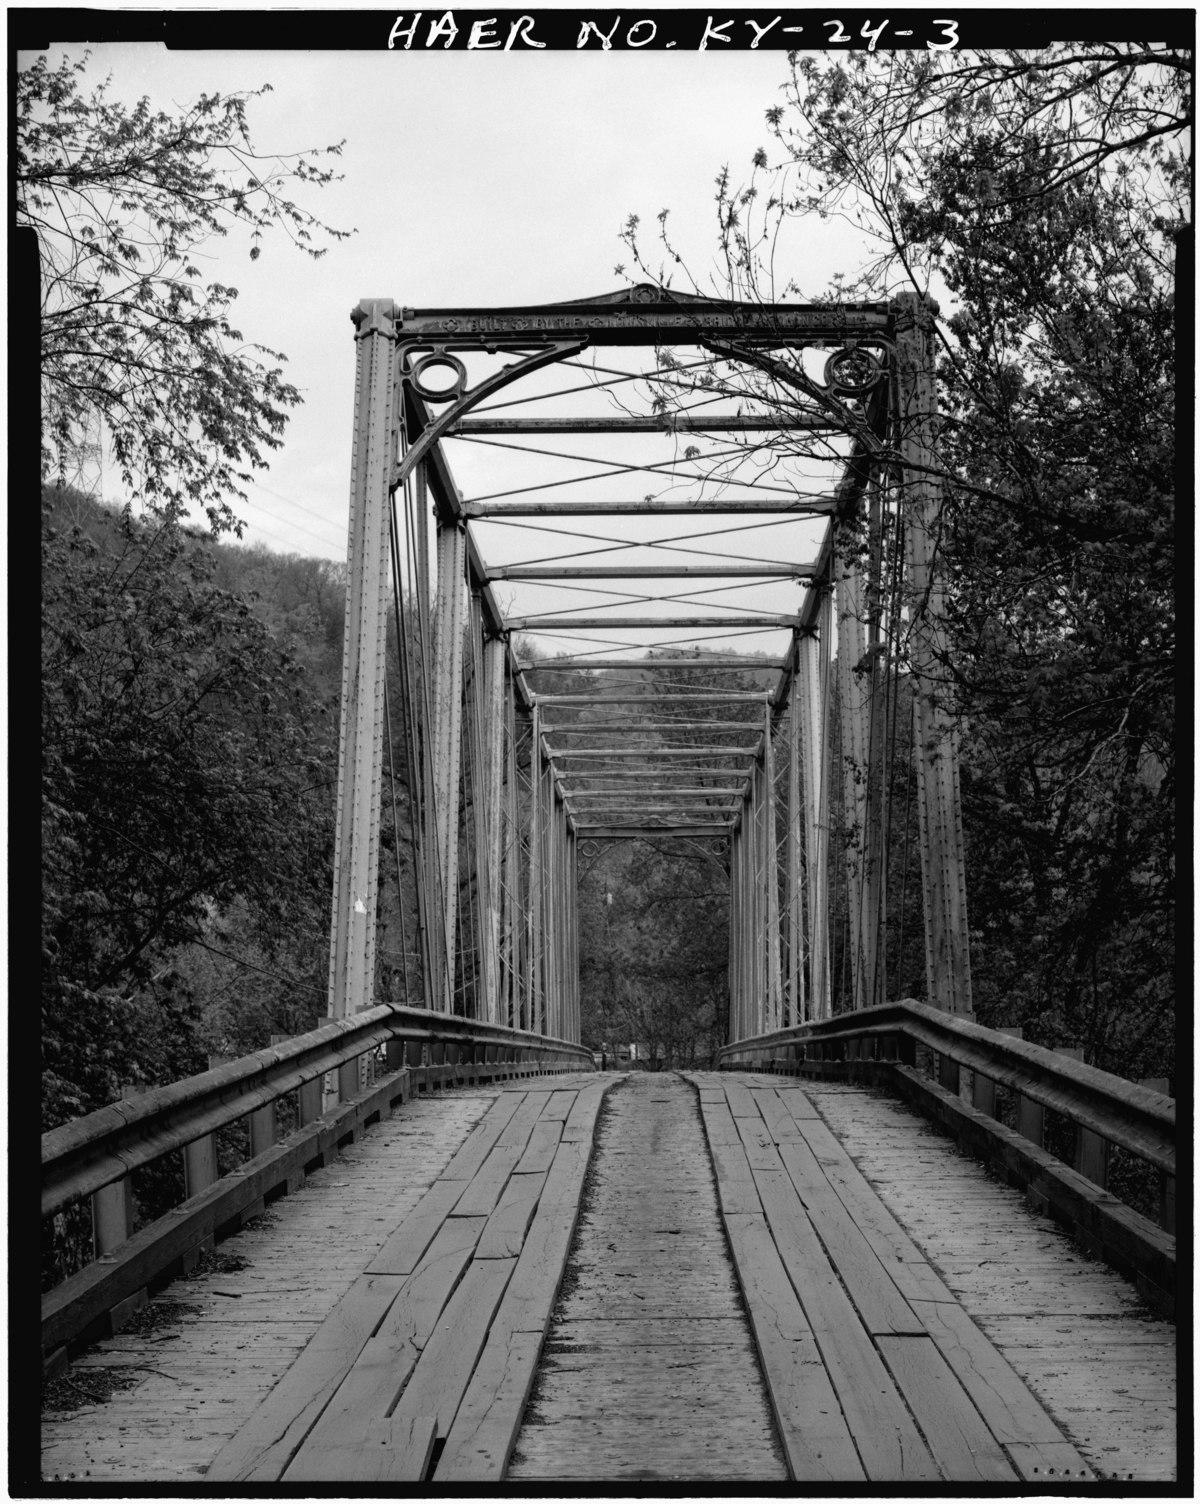 Kentucky Route 2014 Bridge  Wikipedia